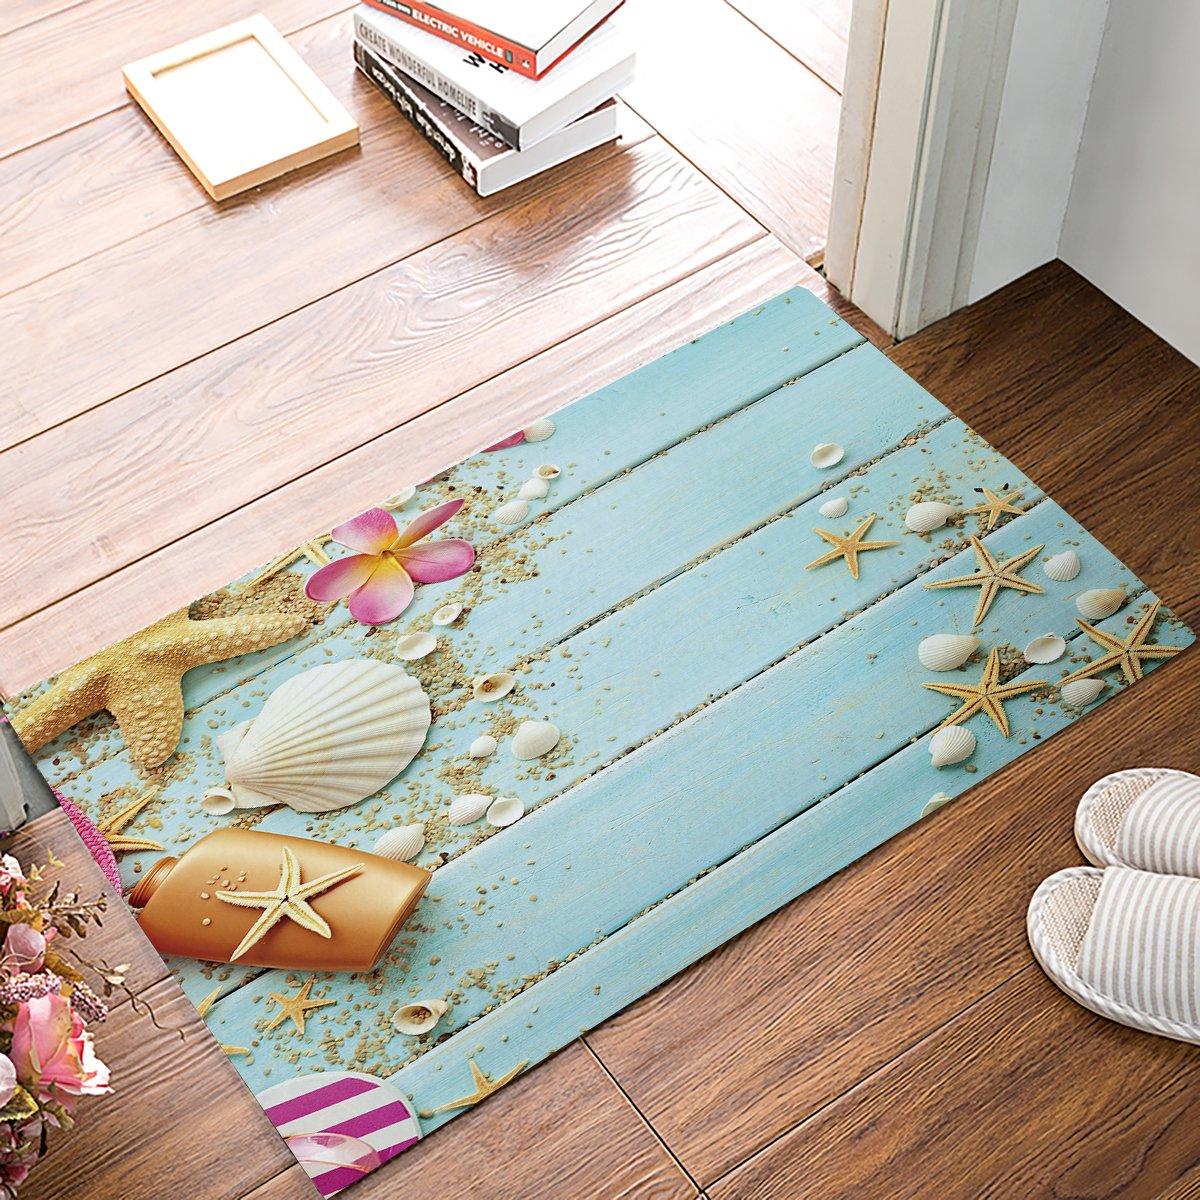 HomeCreator 32 x 20 Inch Beach Theme -Starfish Seashell On The Wood Door Mats Kitchen Floor Bath Entryway Rug Mat Absorbent Indoor Bathroom Decor Doormats Rubber Non Slip